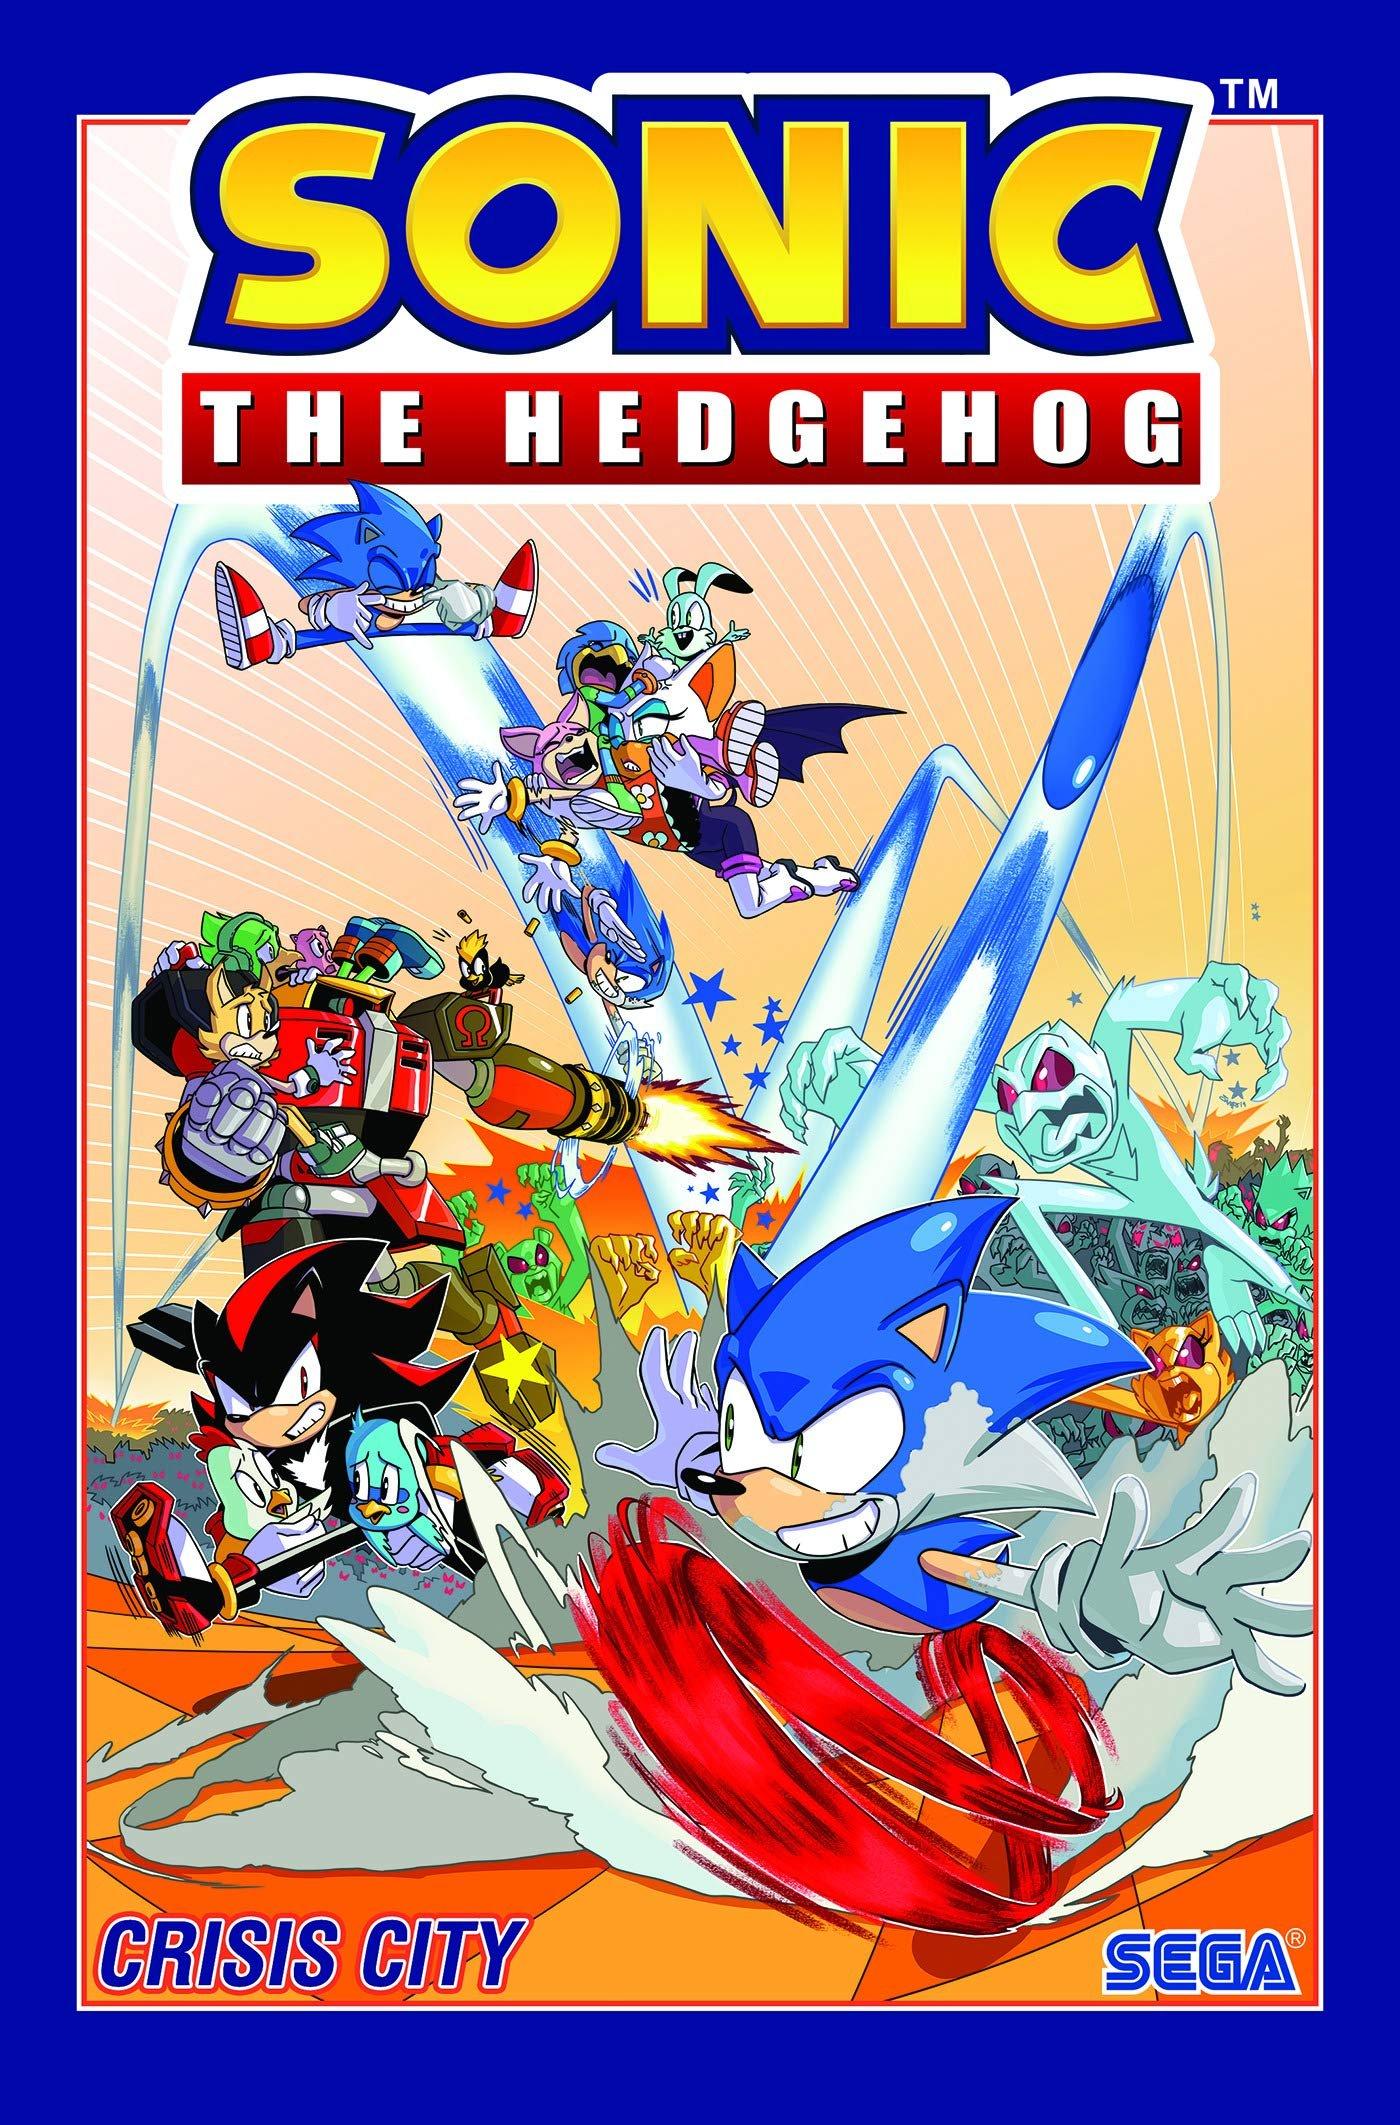 Sonic the Hedgehog Vol.5: Crisis City